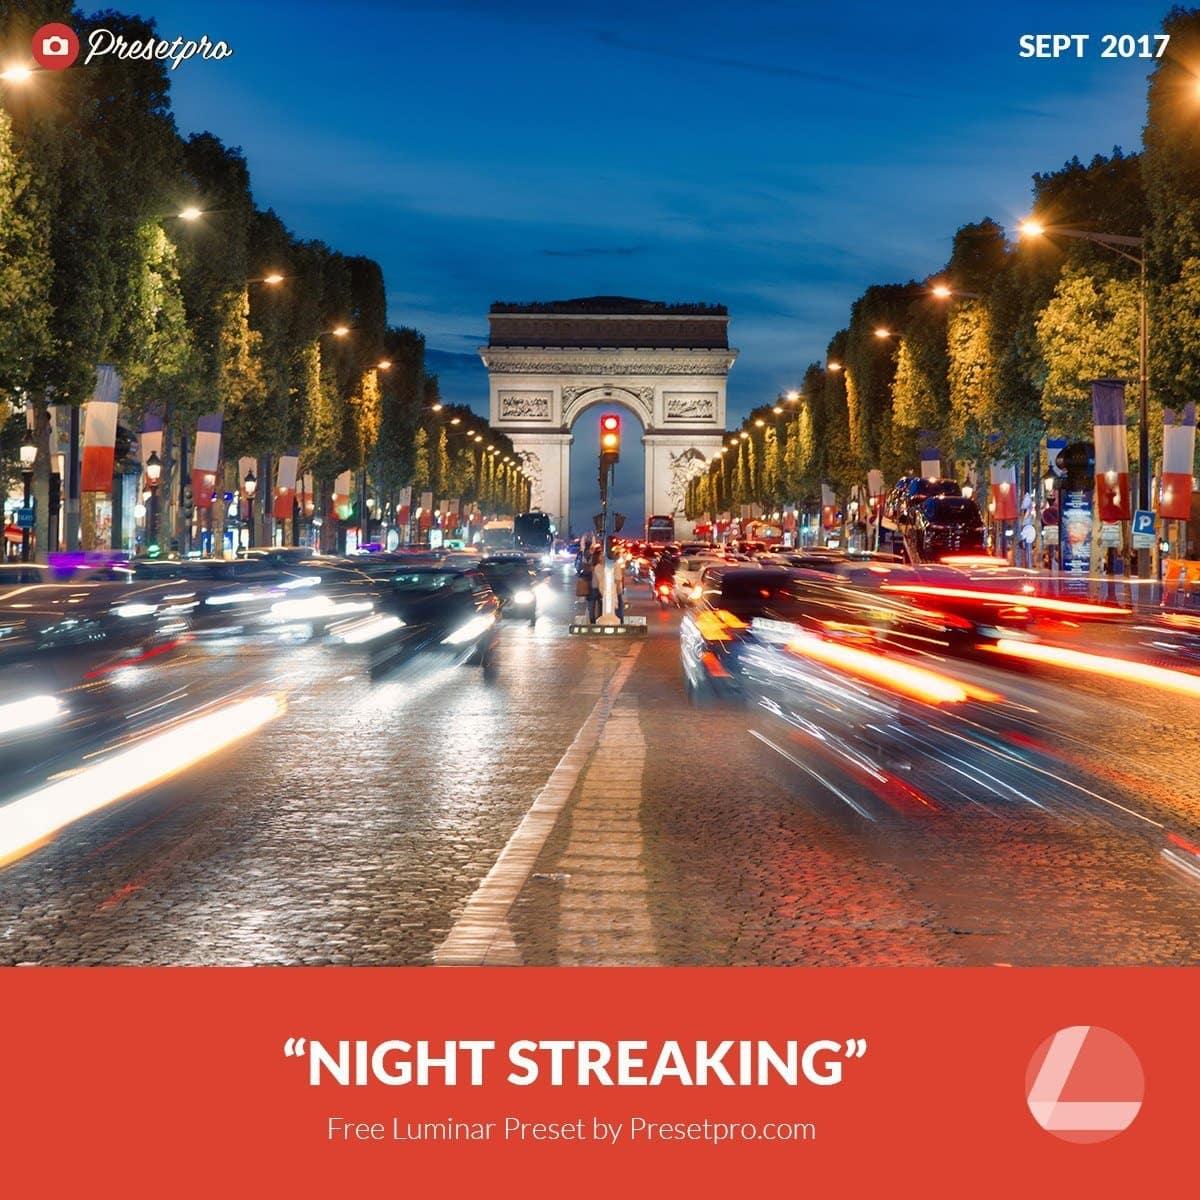 Free-Luminar-Preset-Night-Streaking-Presetpro.com